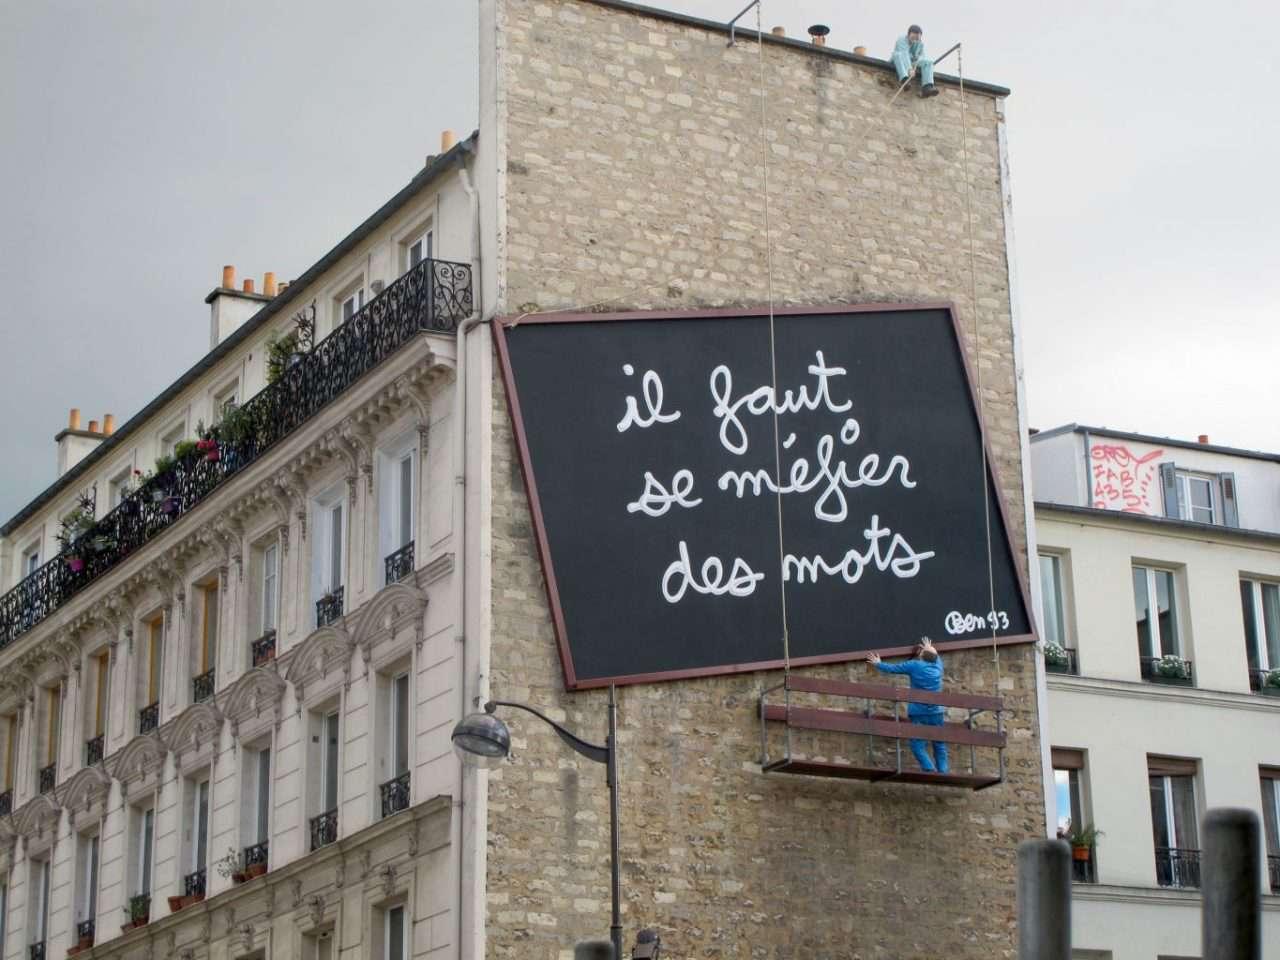 An odd street art installation on Place Frehel in Paris, France